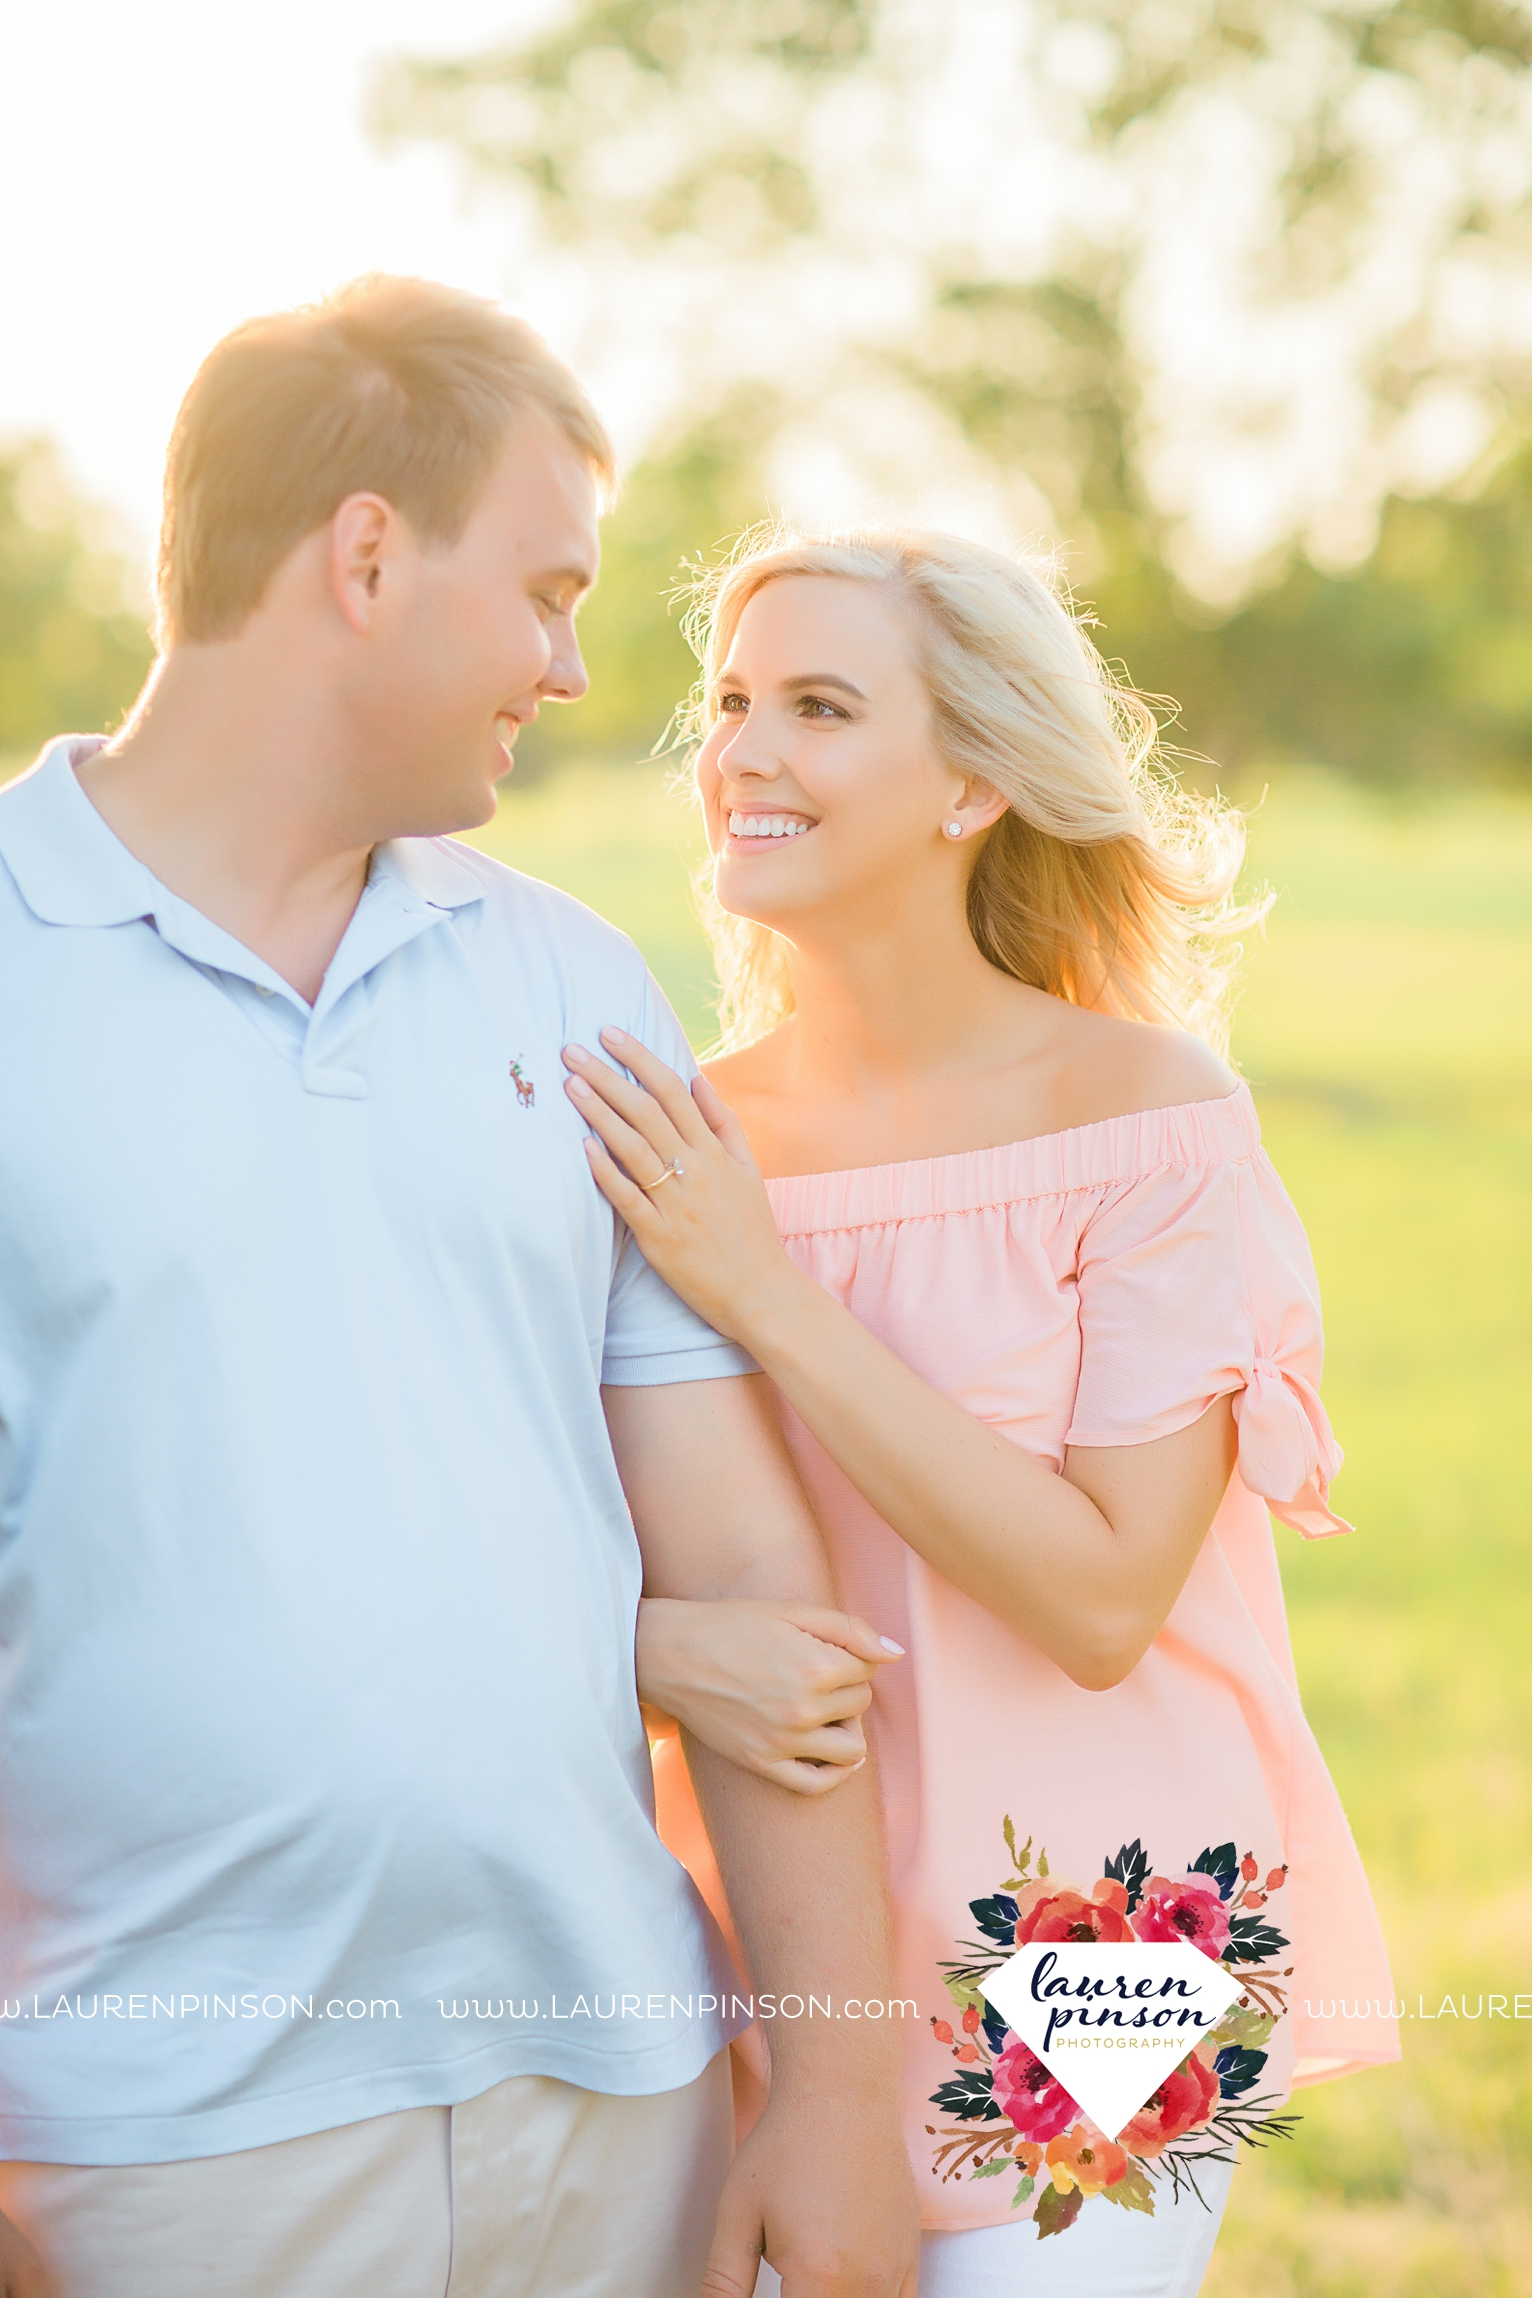 wichita-falls-texas-wedding-photographer-beachy-engagement-session-at-lake-wichita_2891.jpg